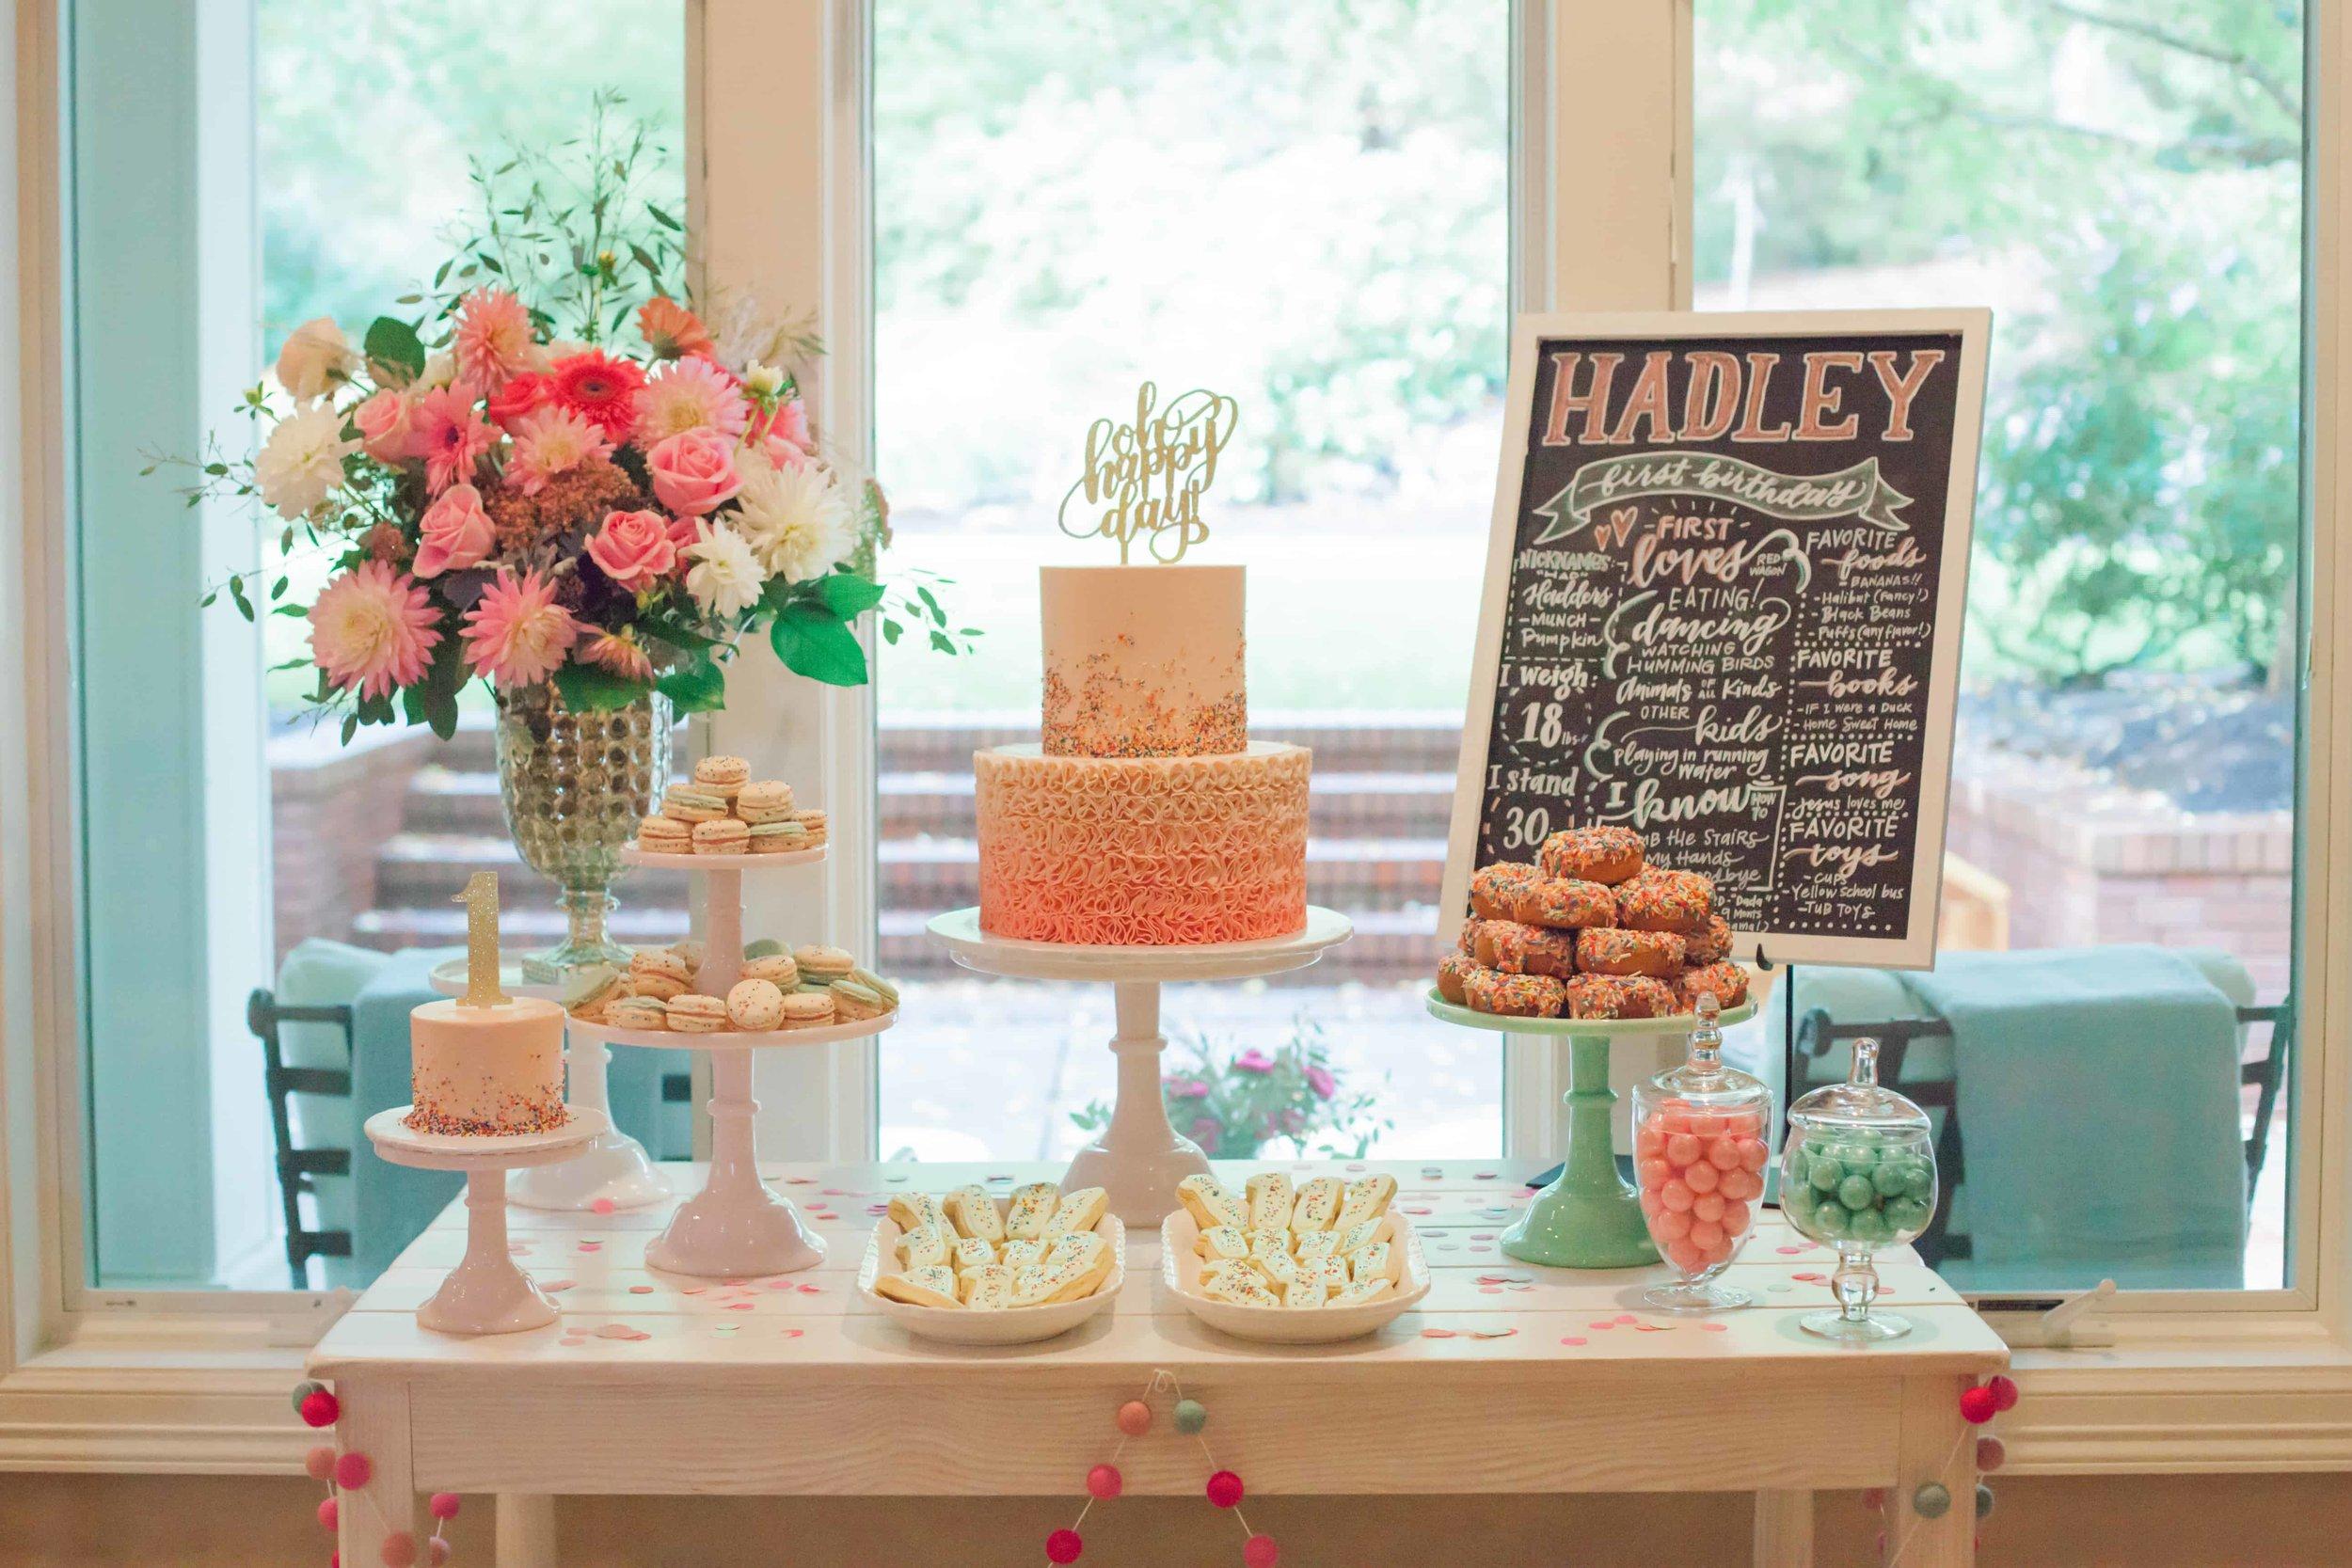 Hadley-First-Birthday-Dessert-Table.jpg